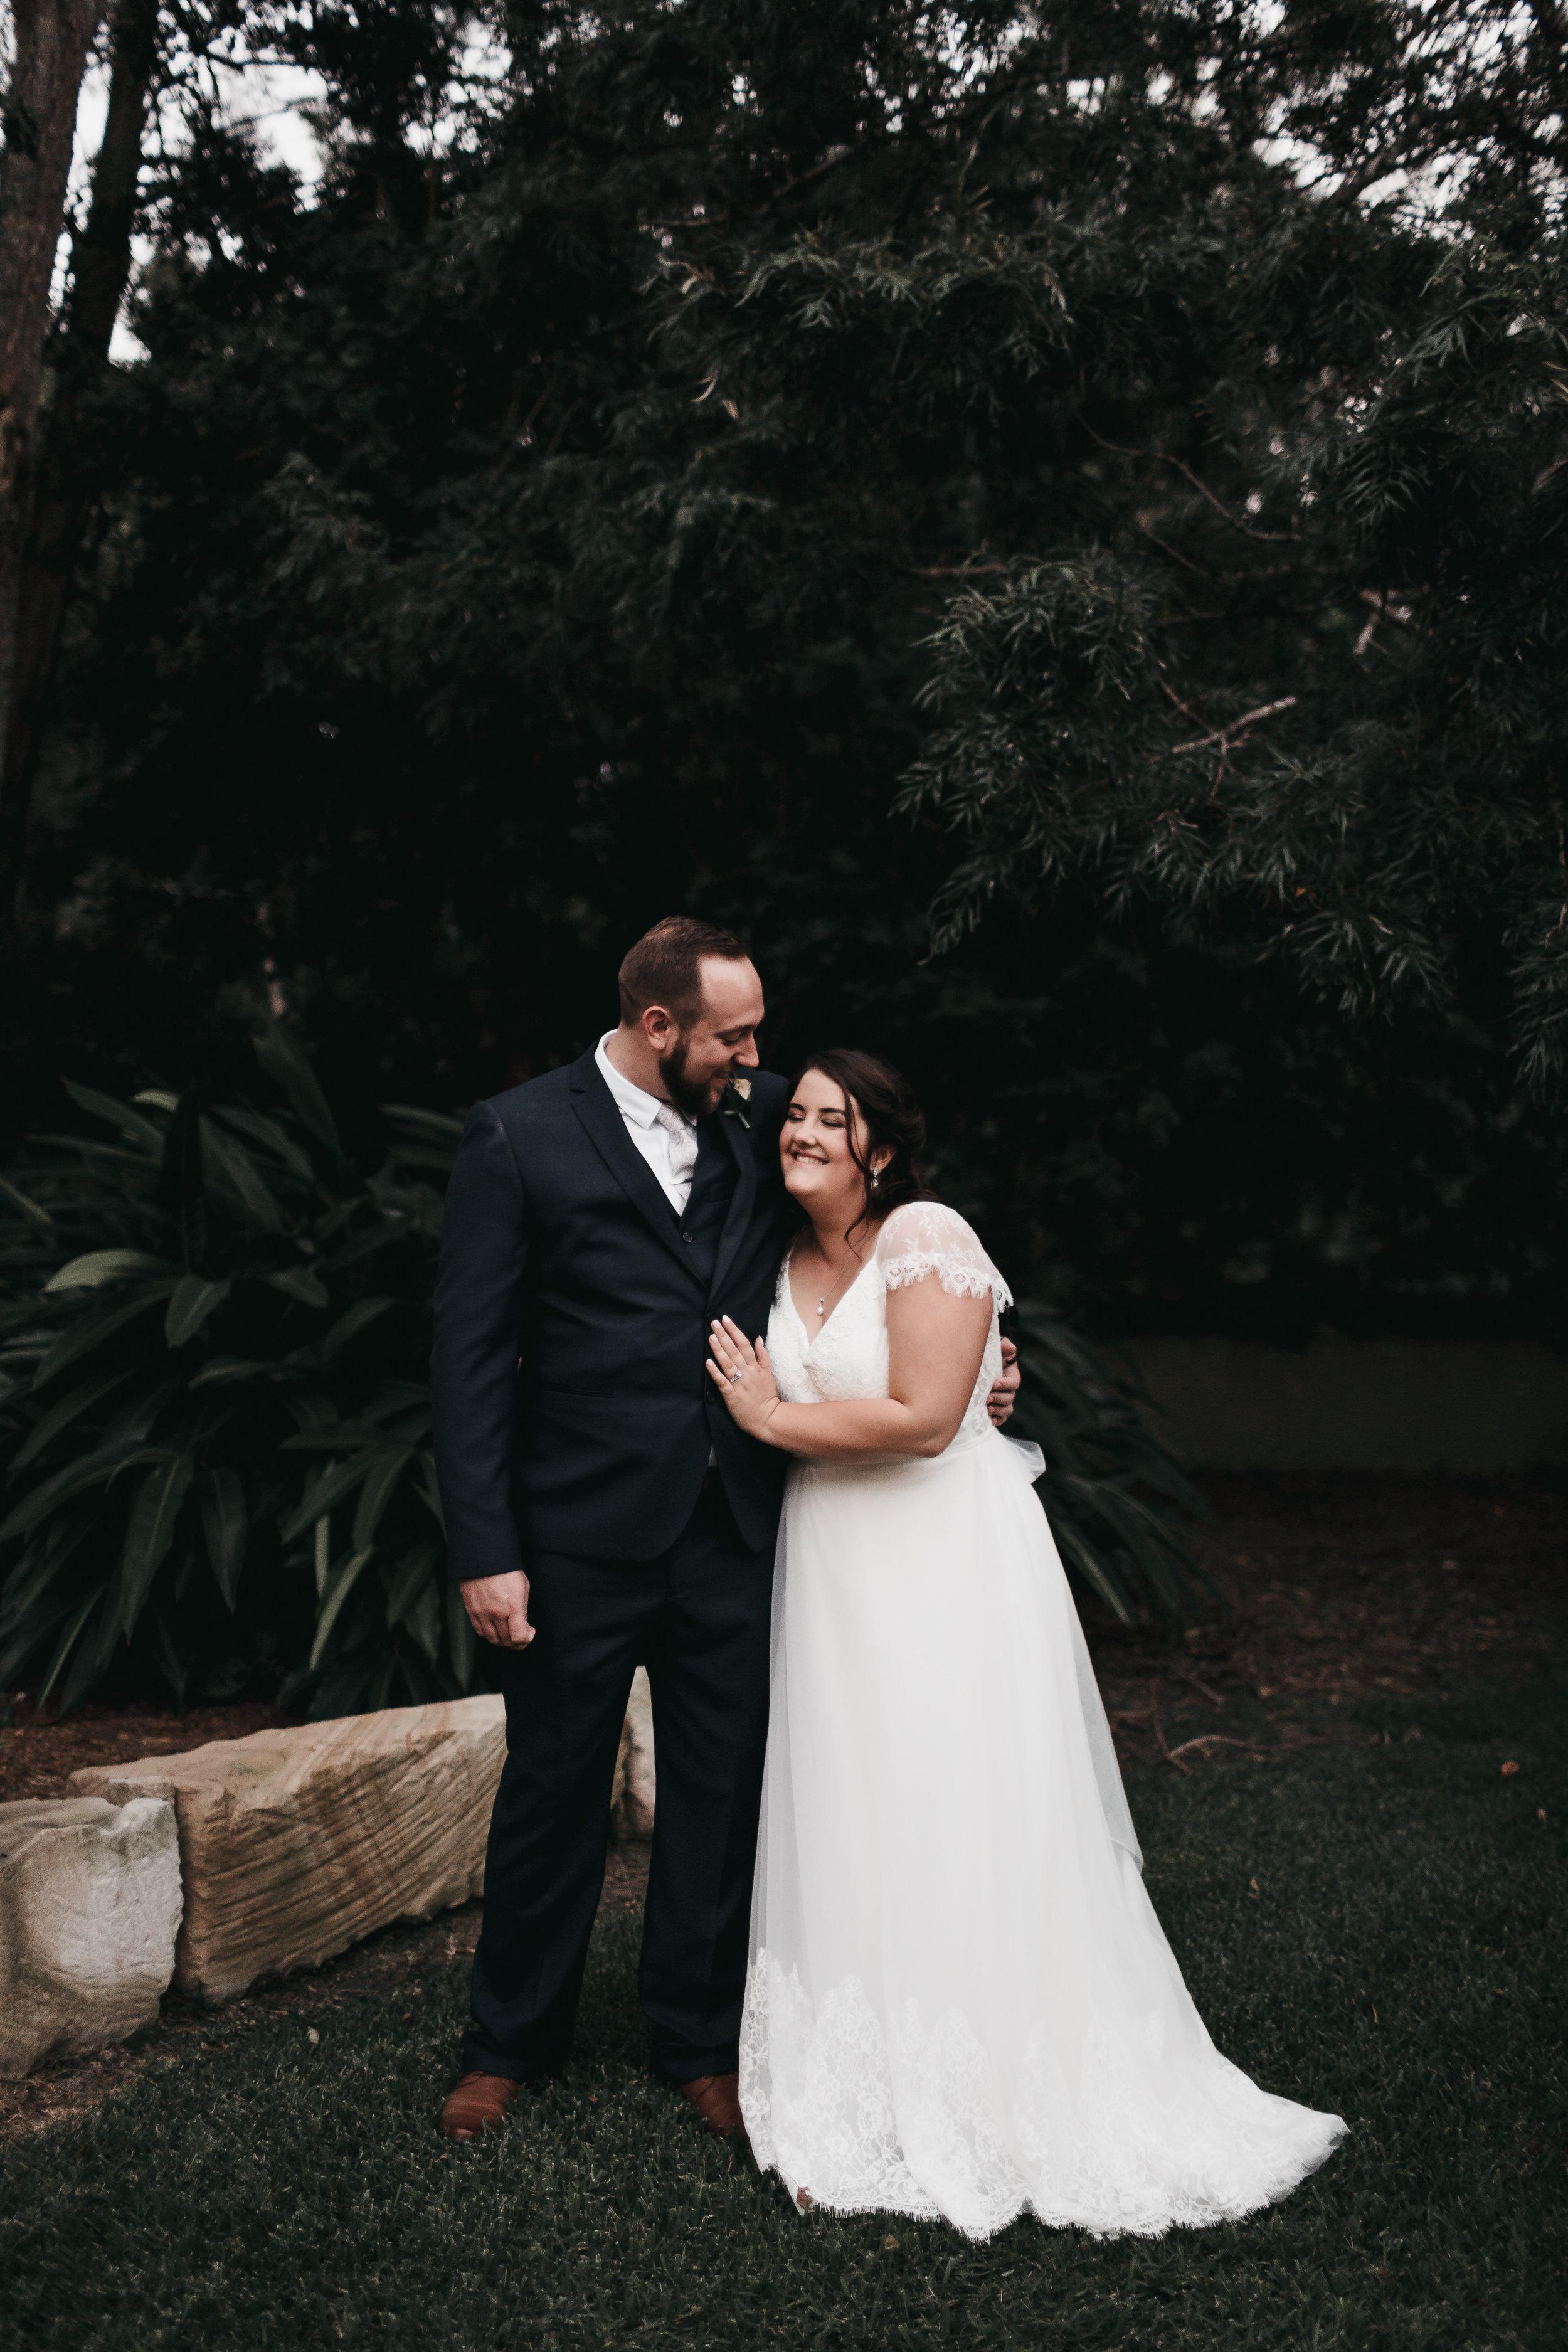 bondwedding-629.jpg